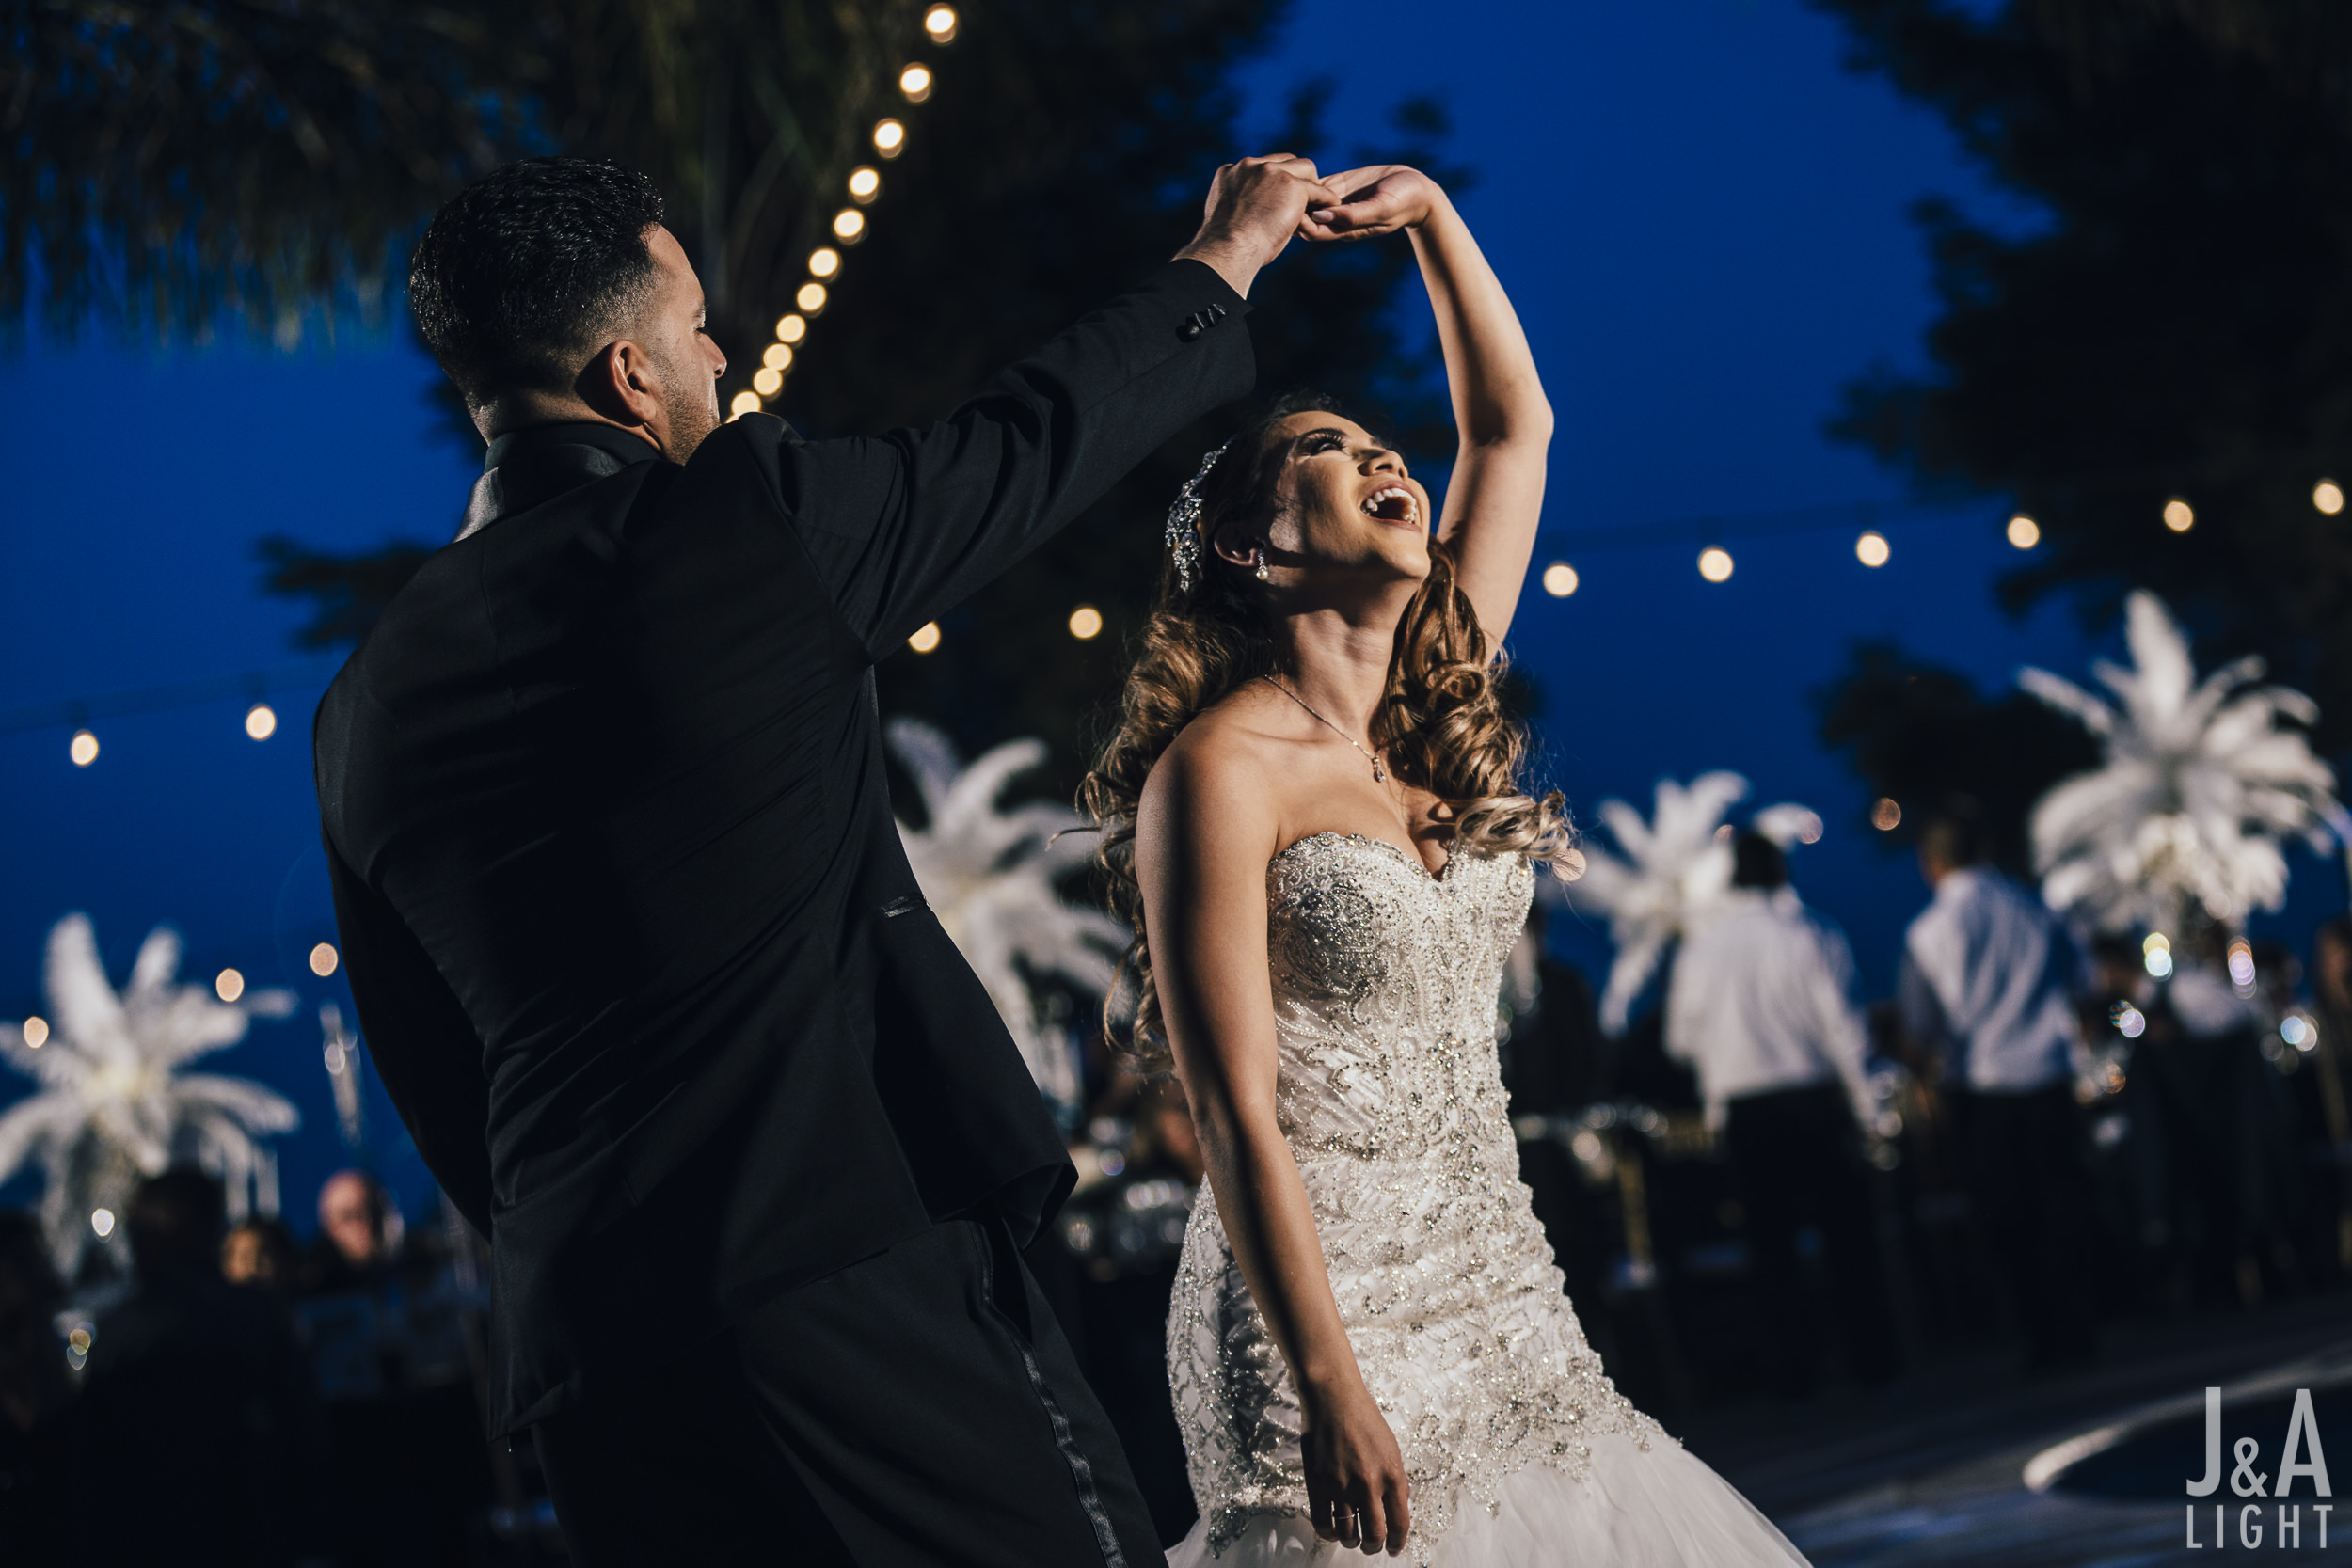 20171014-JanDan-LosBanos-GlassMansion-Wedding-Blog-064.jpg